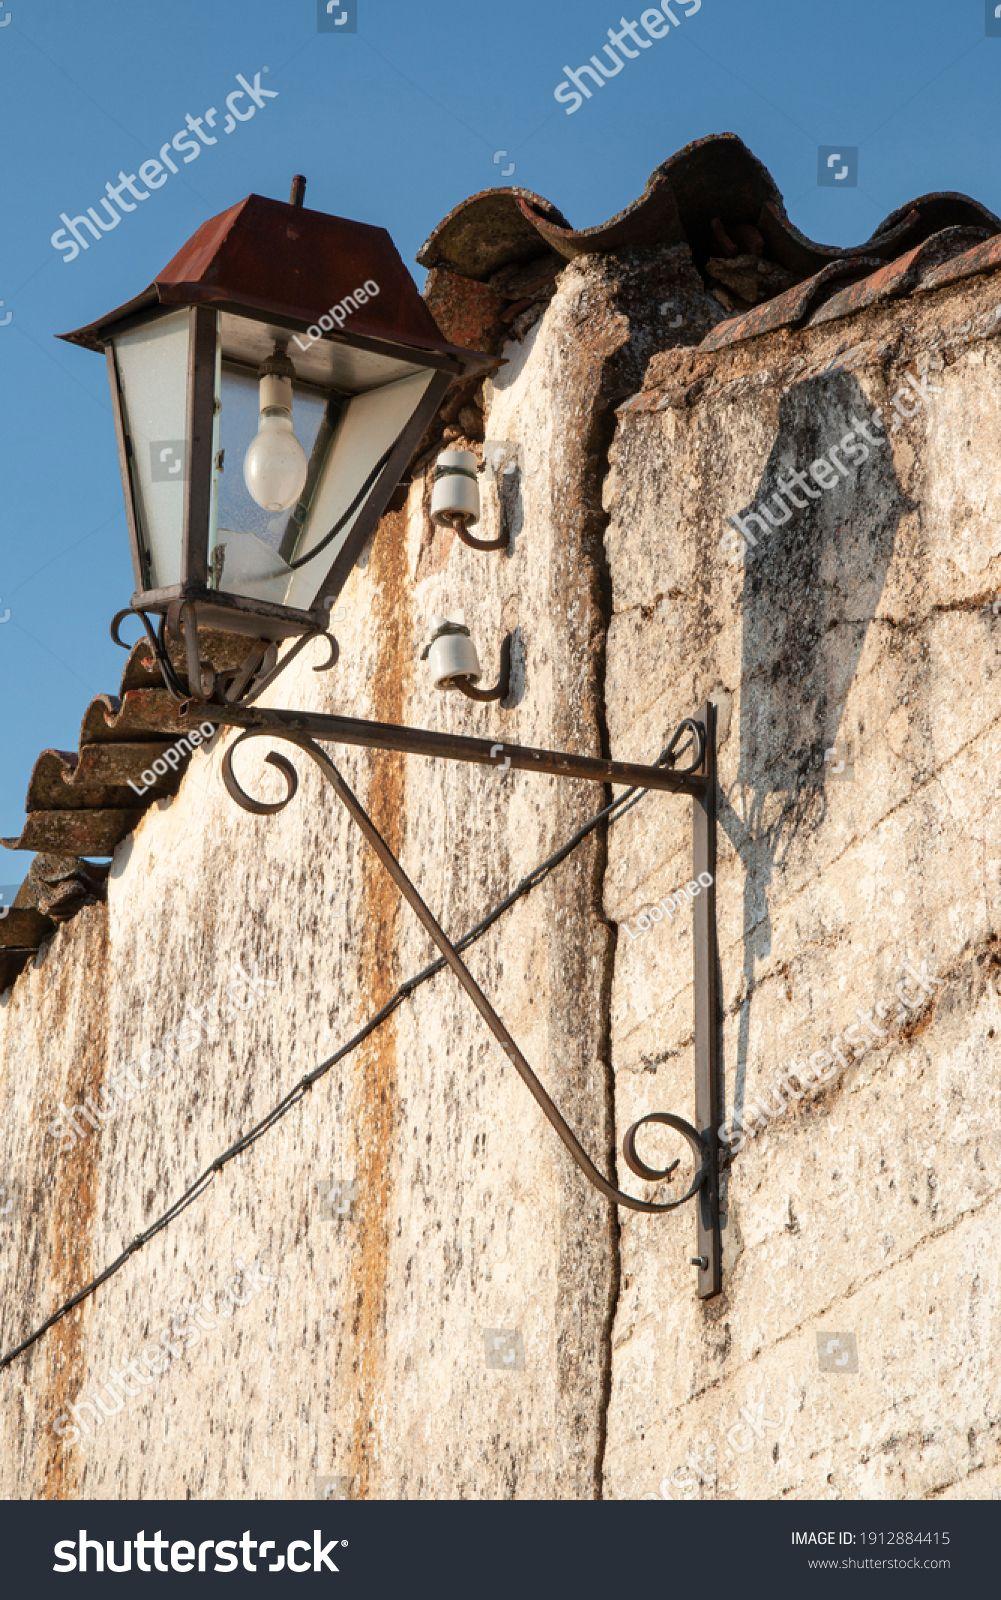 shutterstock paisajes de Andalucía